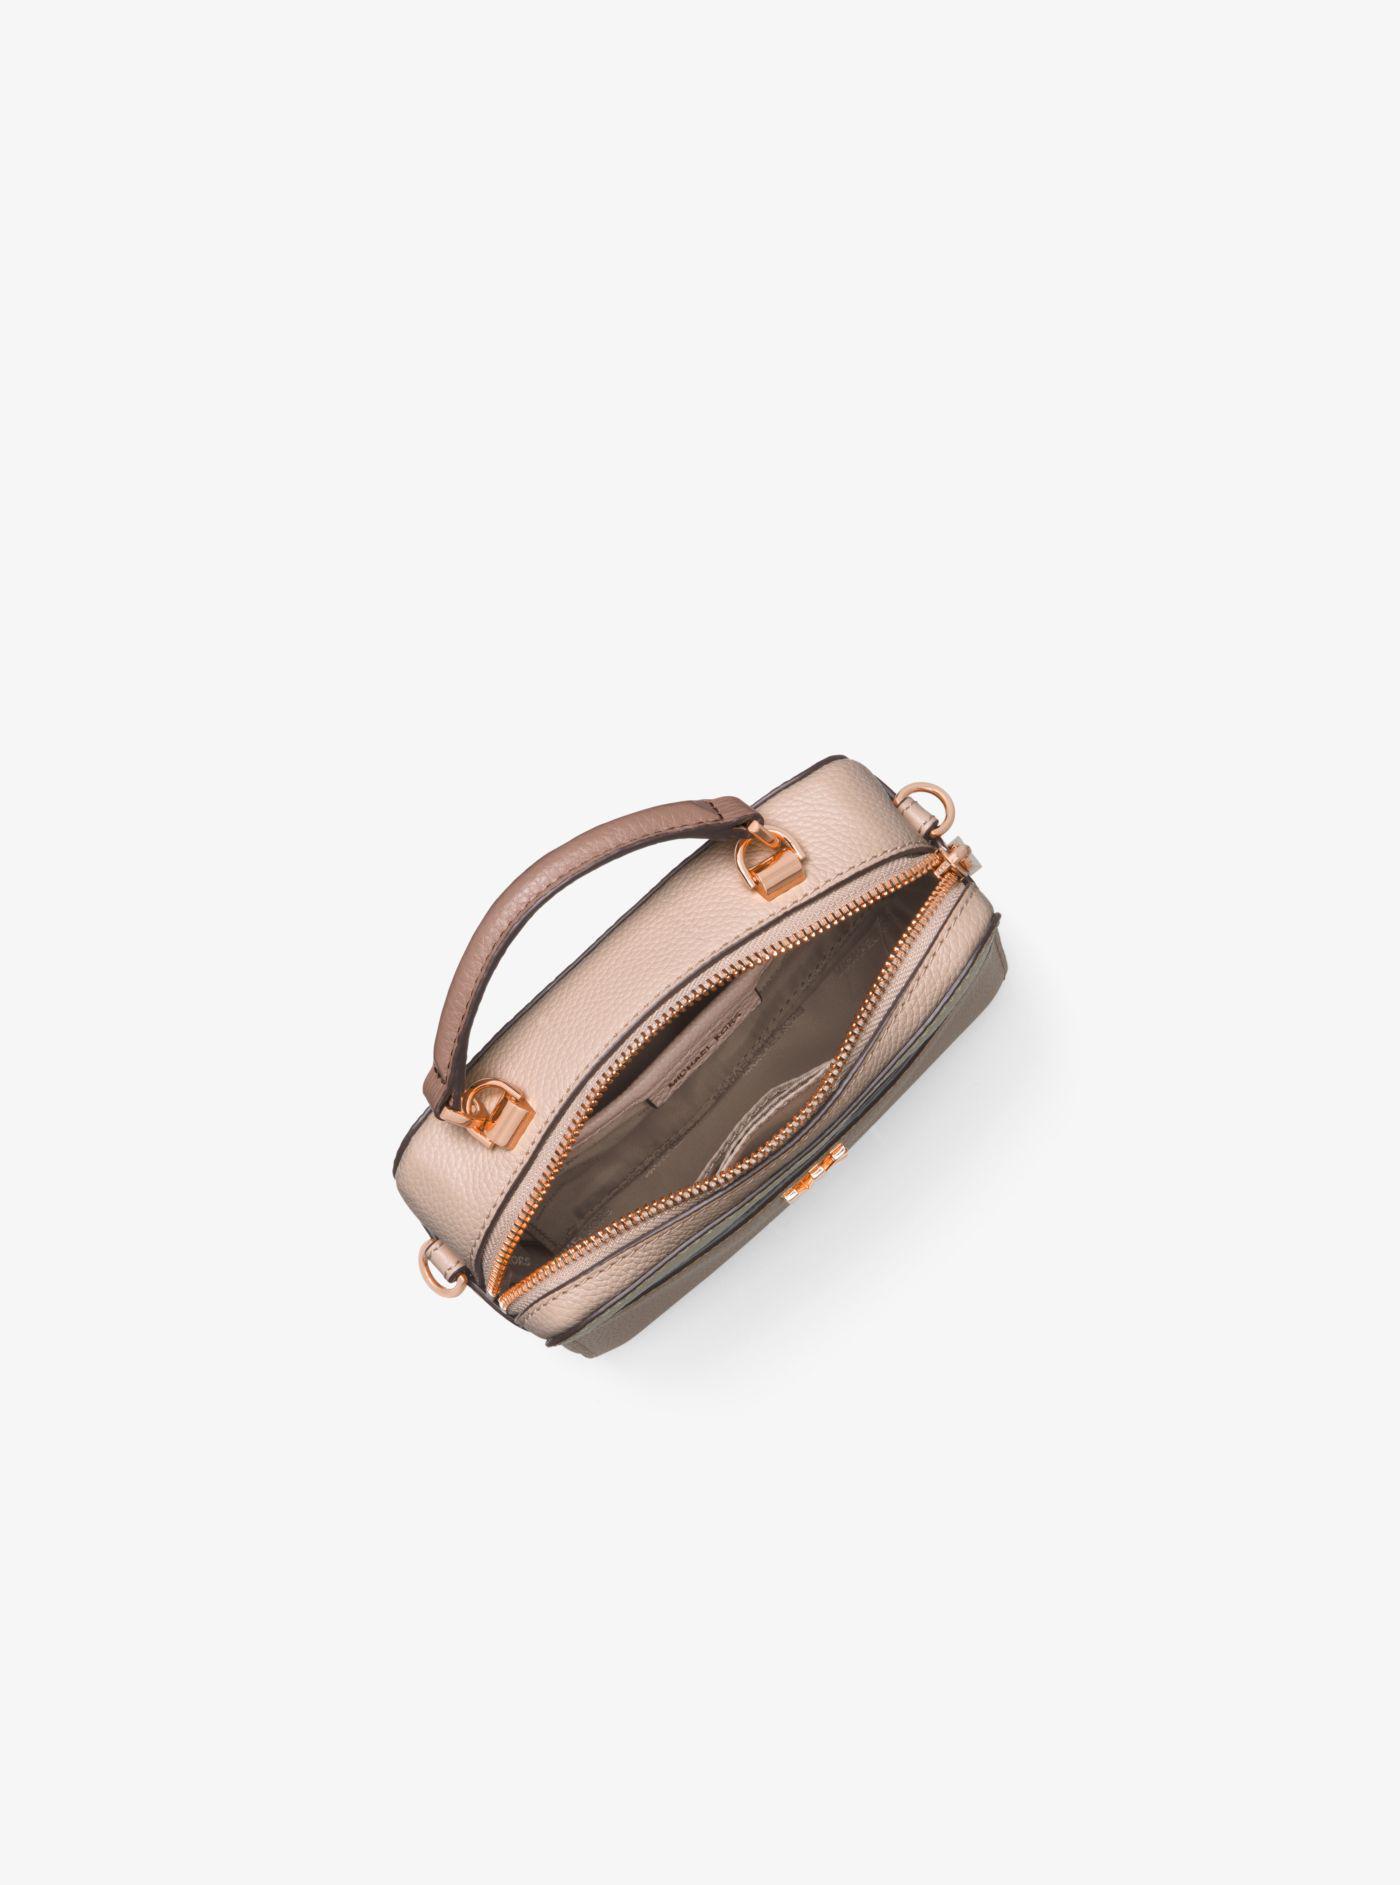 60479cef7955 Michael Kors Mott Mini Color-block Pebbled Leather Crossbody - Lyst